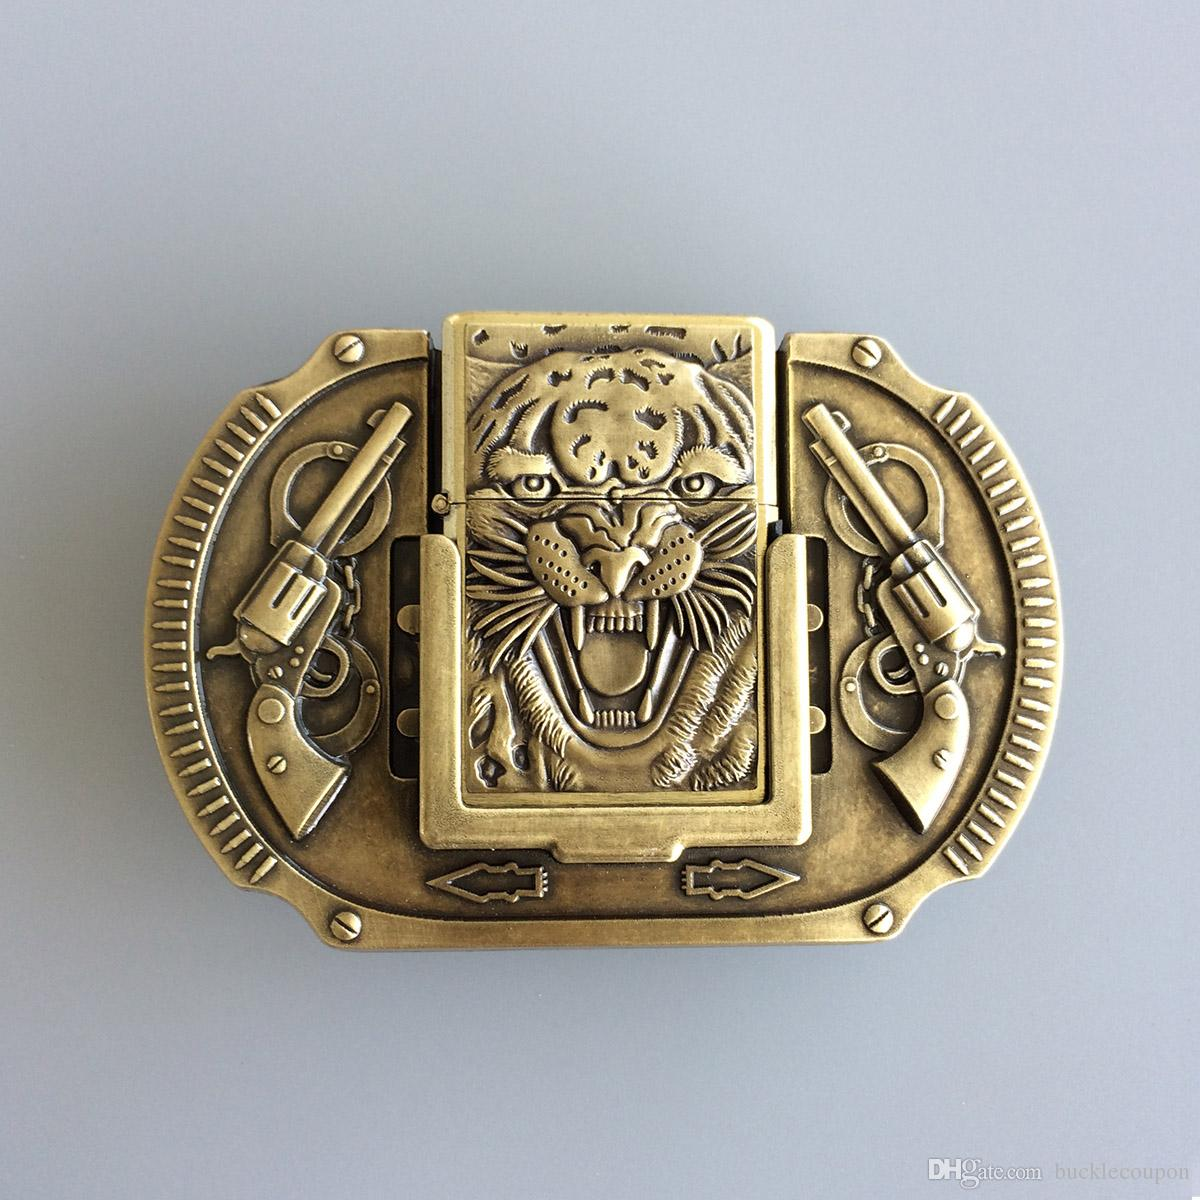 Antique Bronze Plated Tiger Metal Belt Buckle